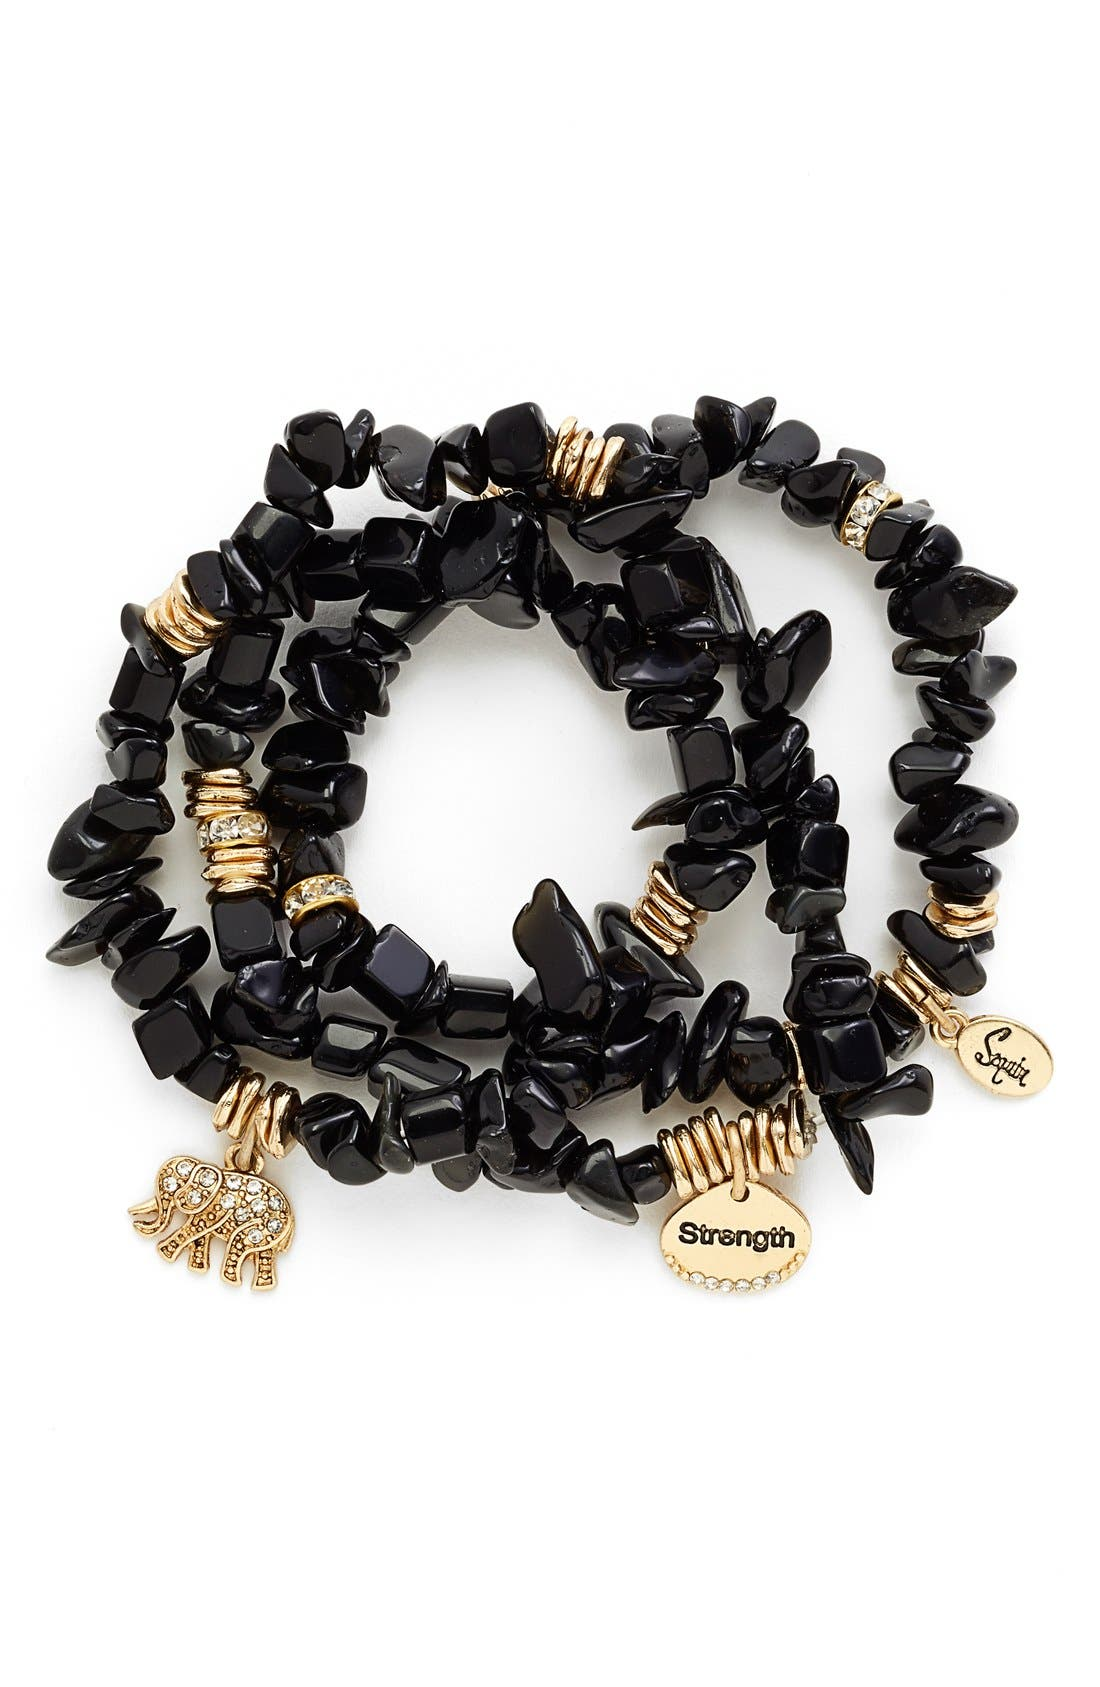 Alternate Image 1 Selected - Sequin Stone Stretch Bracelets (Set of 3)